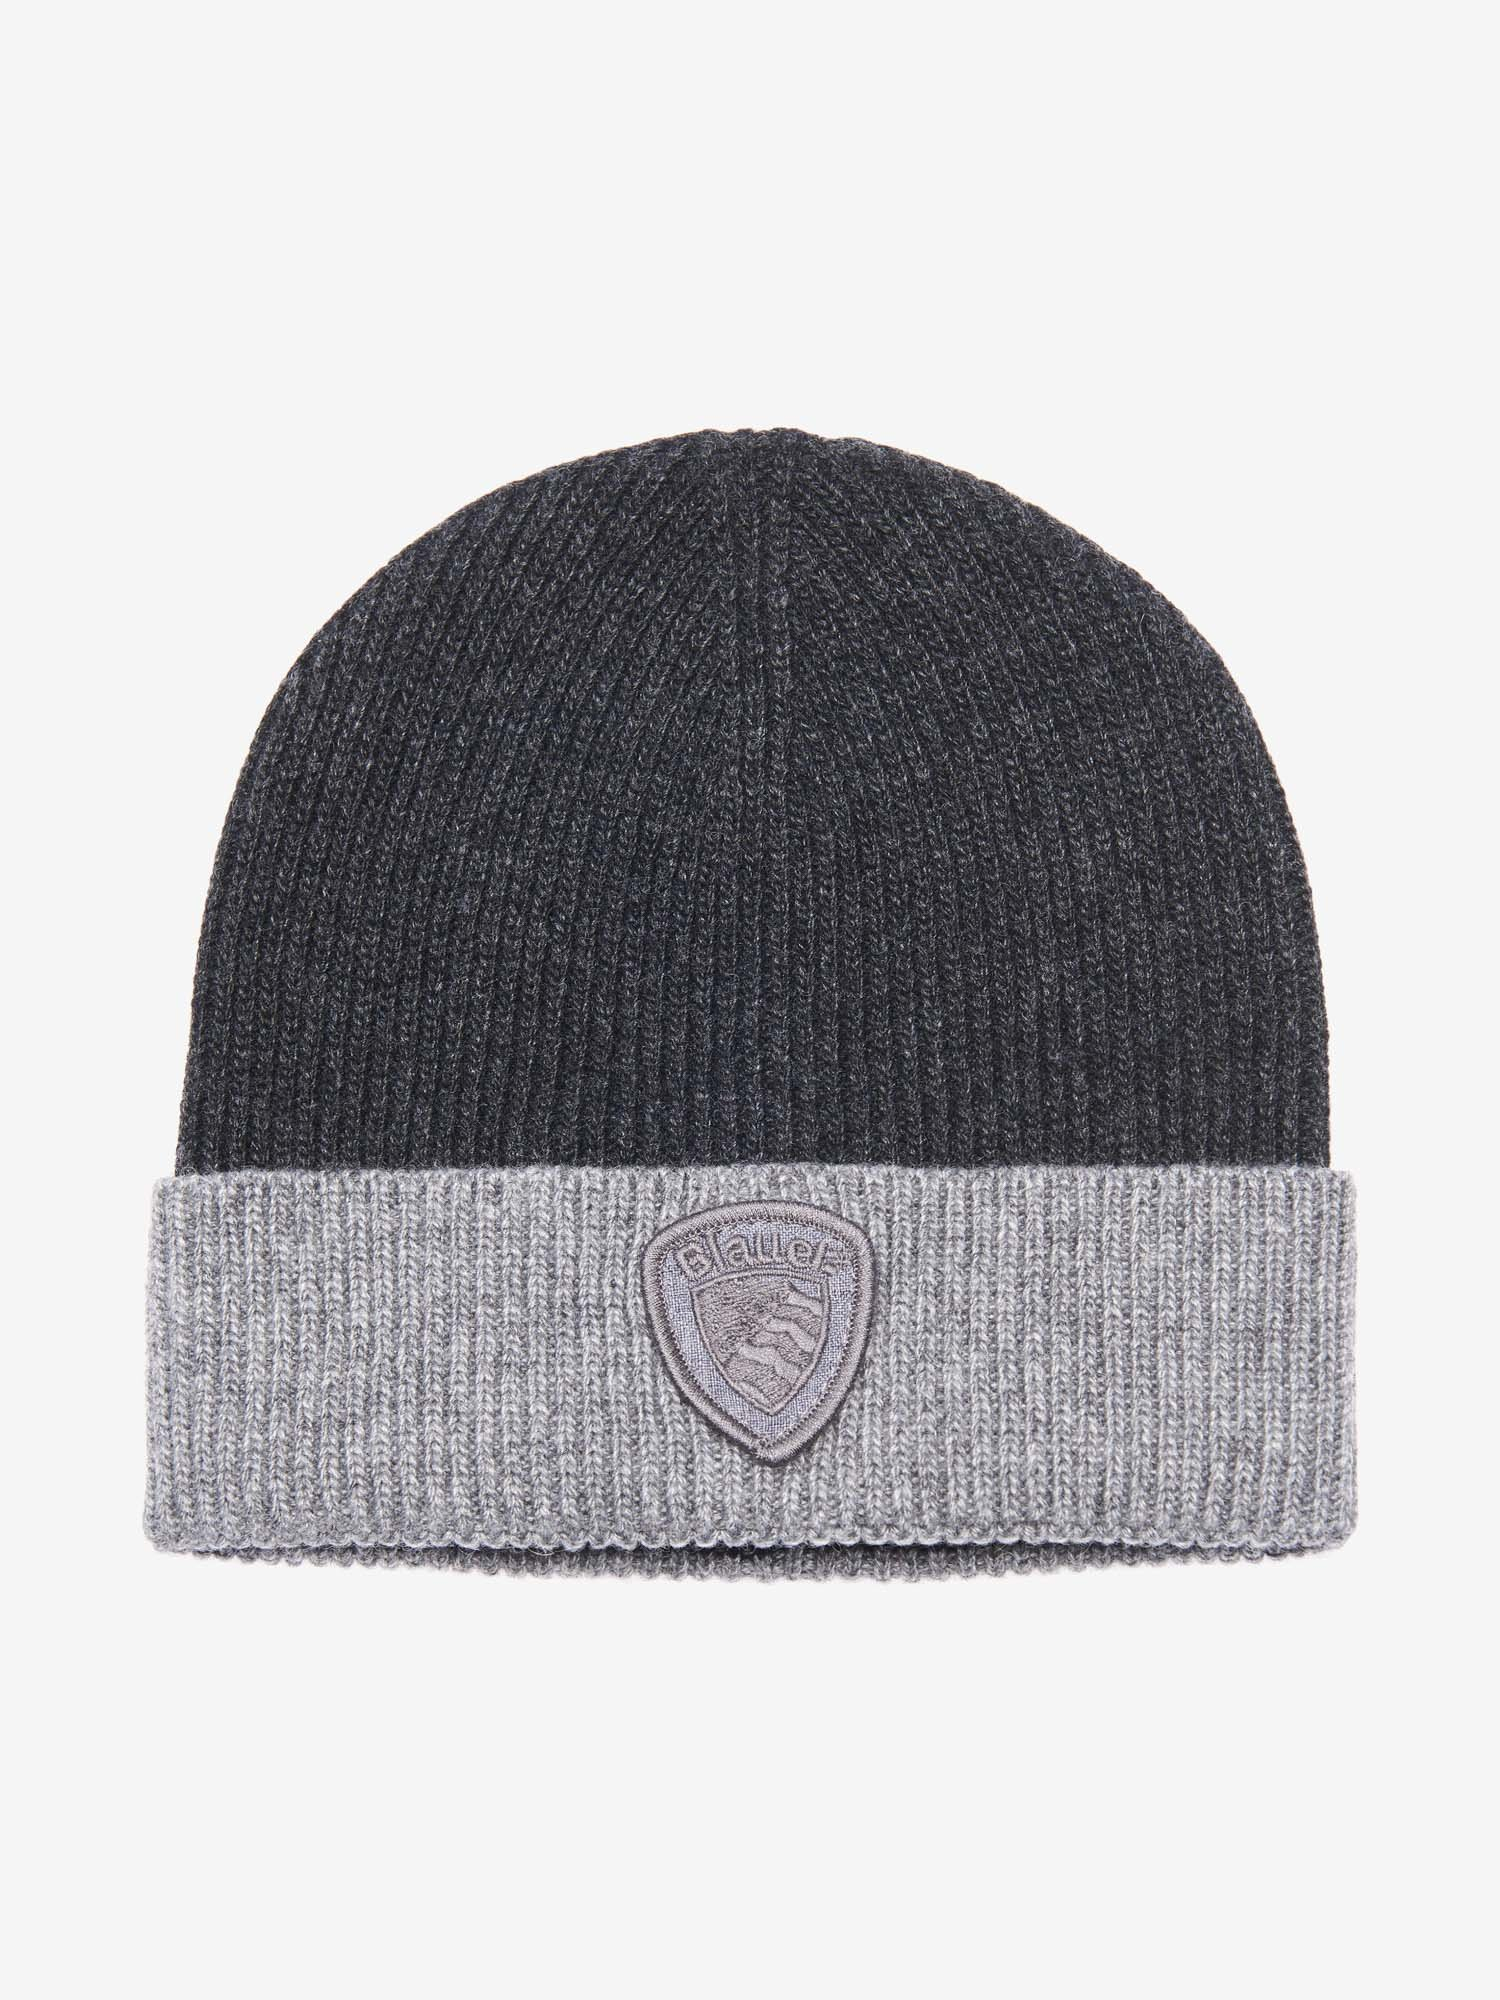 TWO-TONE CAP - Blauer